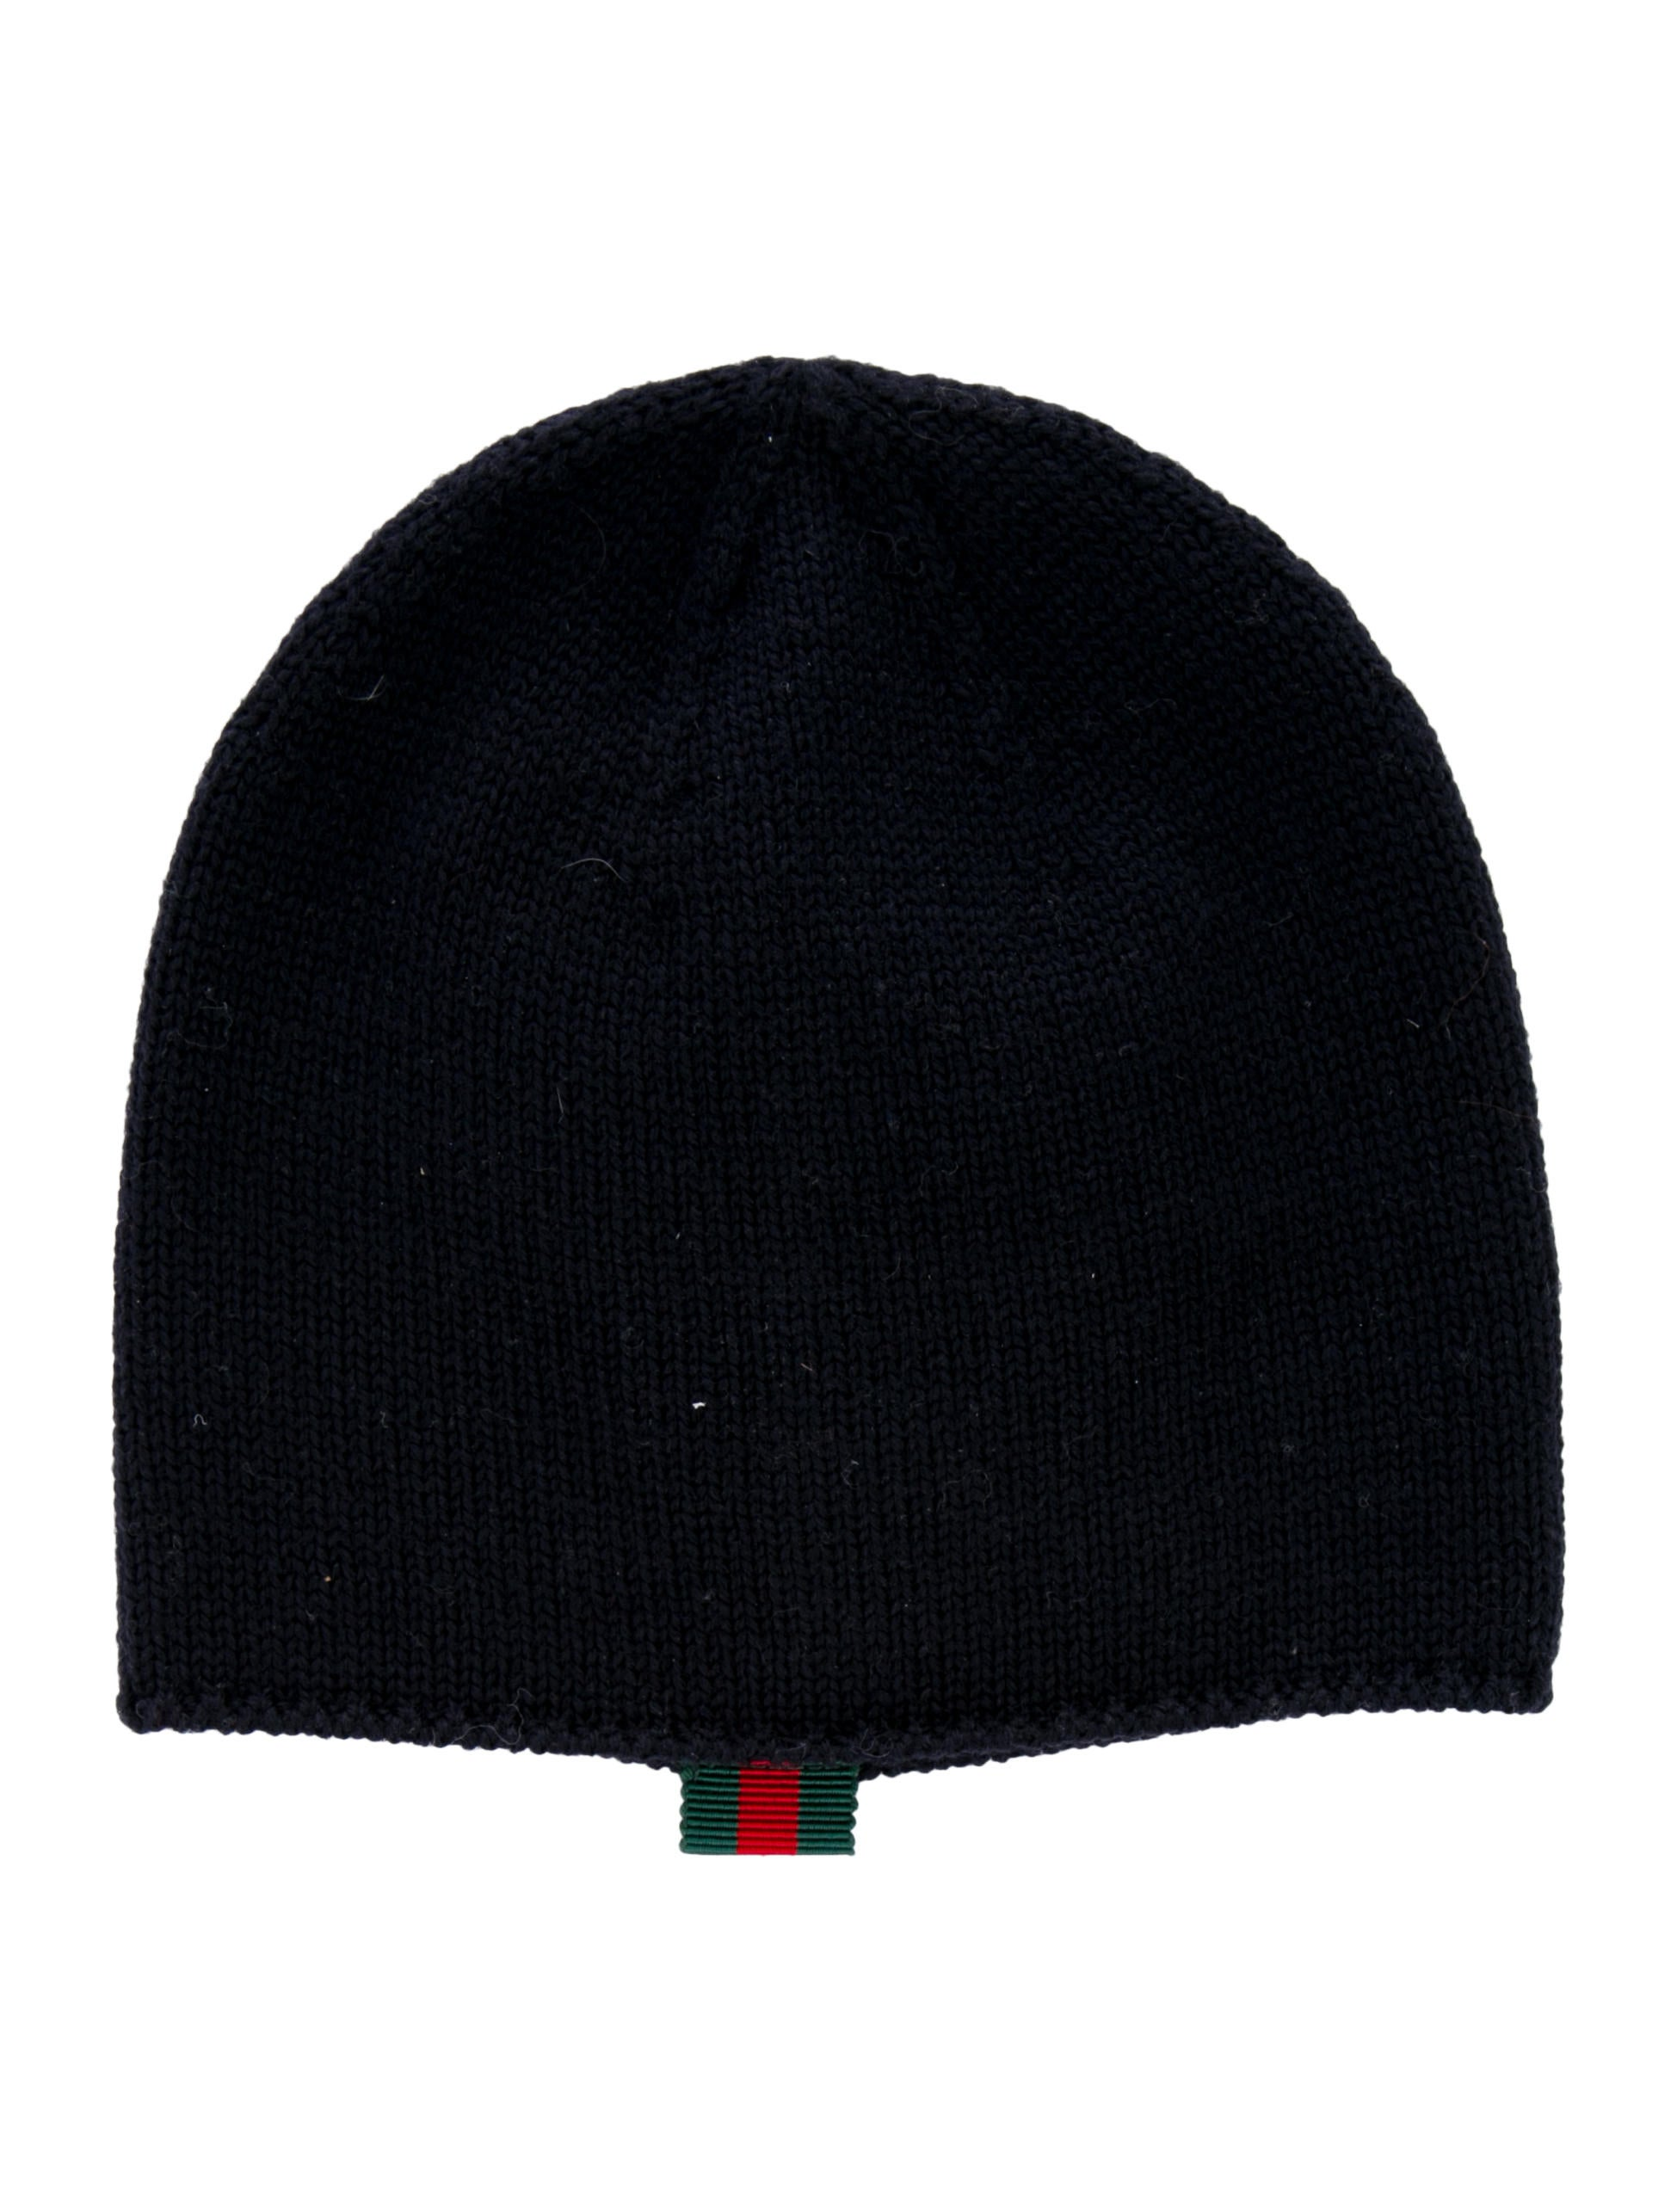 283875de104 Gucci Web Wool Hat w  Tags - Boys - GUC228982